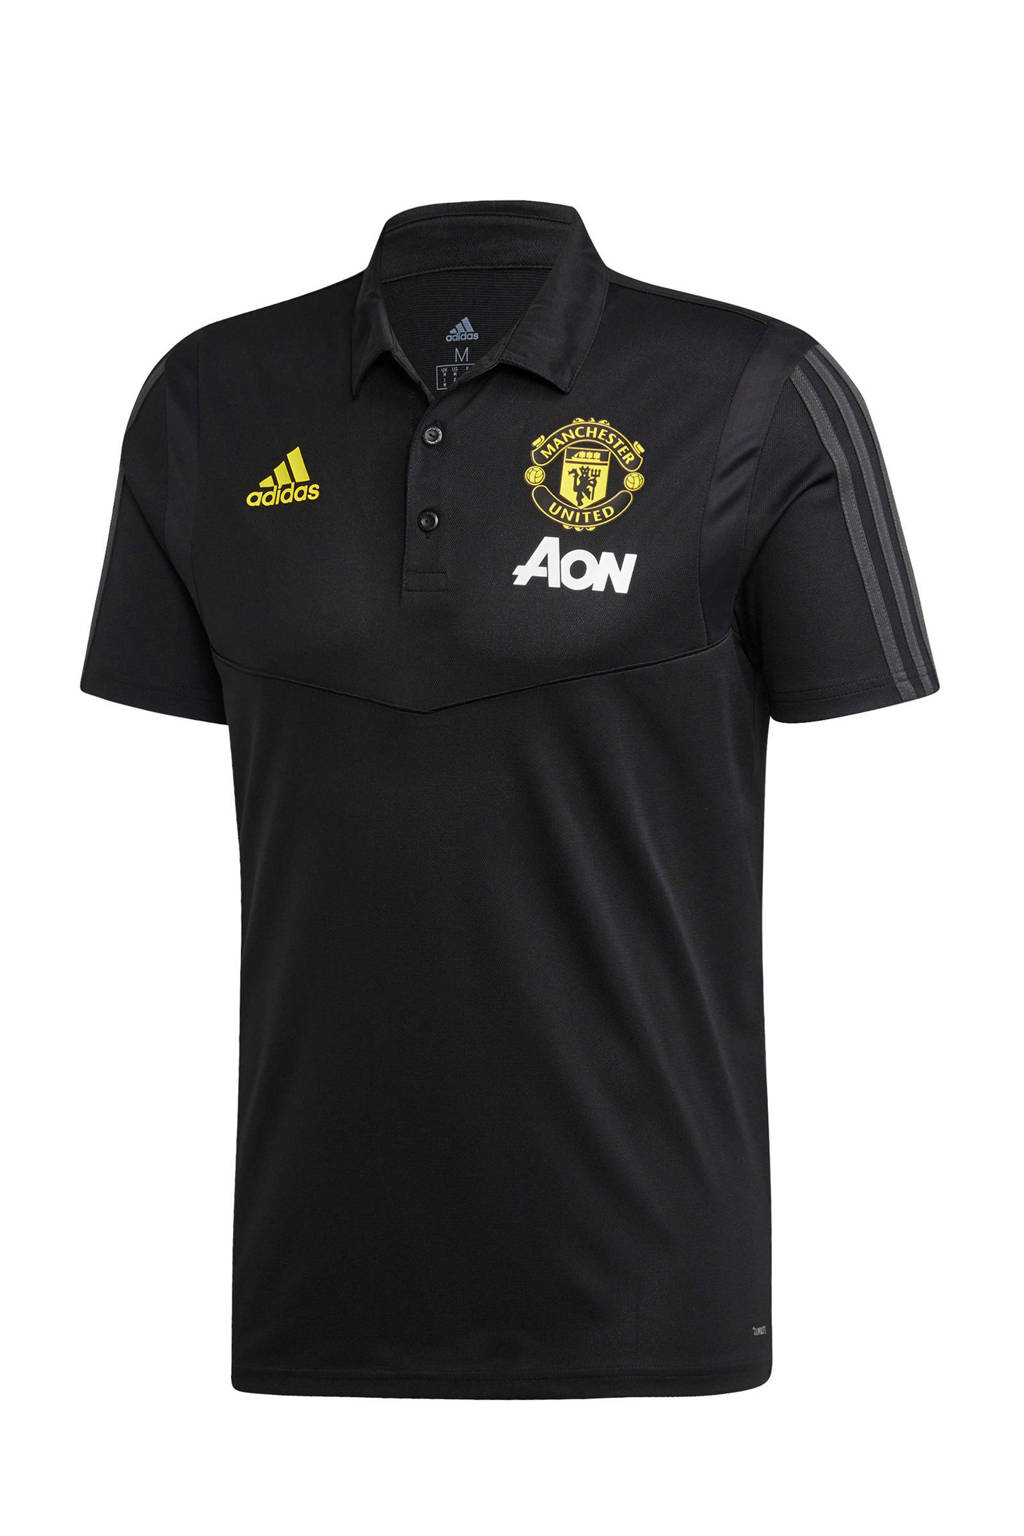 adidas Senior Manchester United voetbalpolo, Zwart/goud